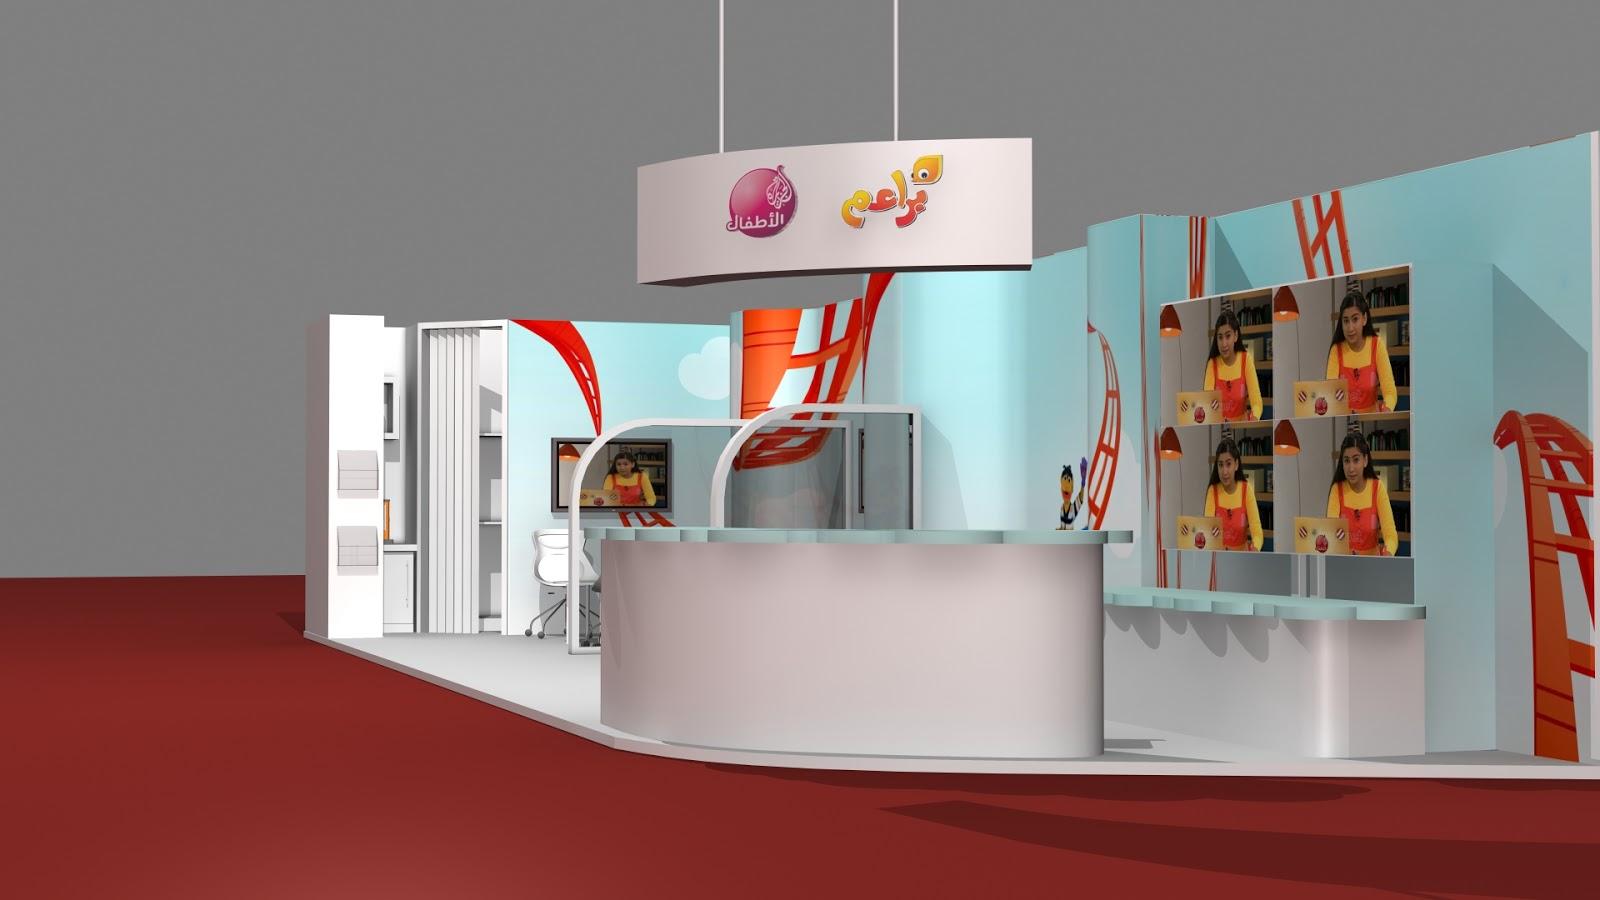 3d Exhibition Model : Sajid designs d exhibition booth model